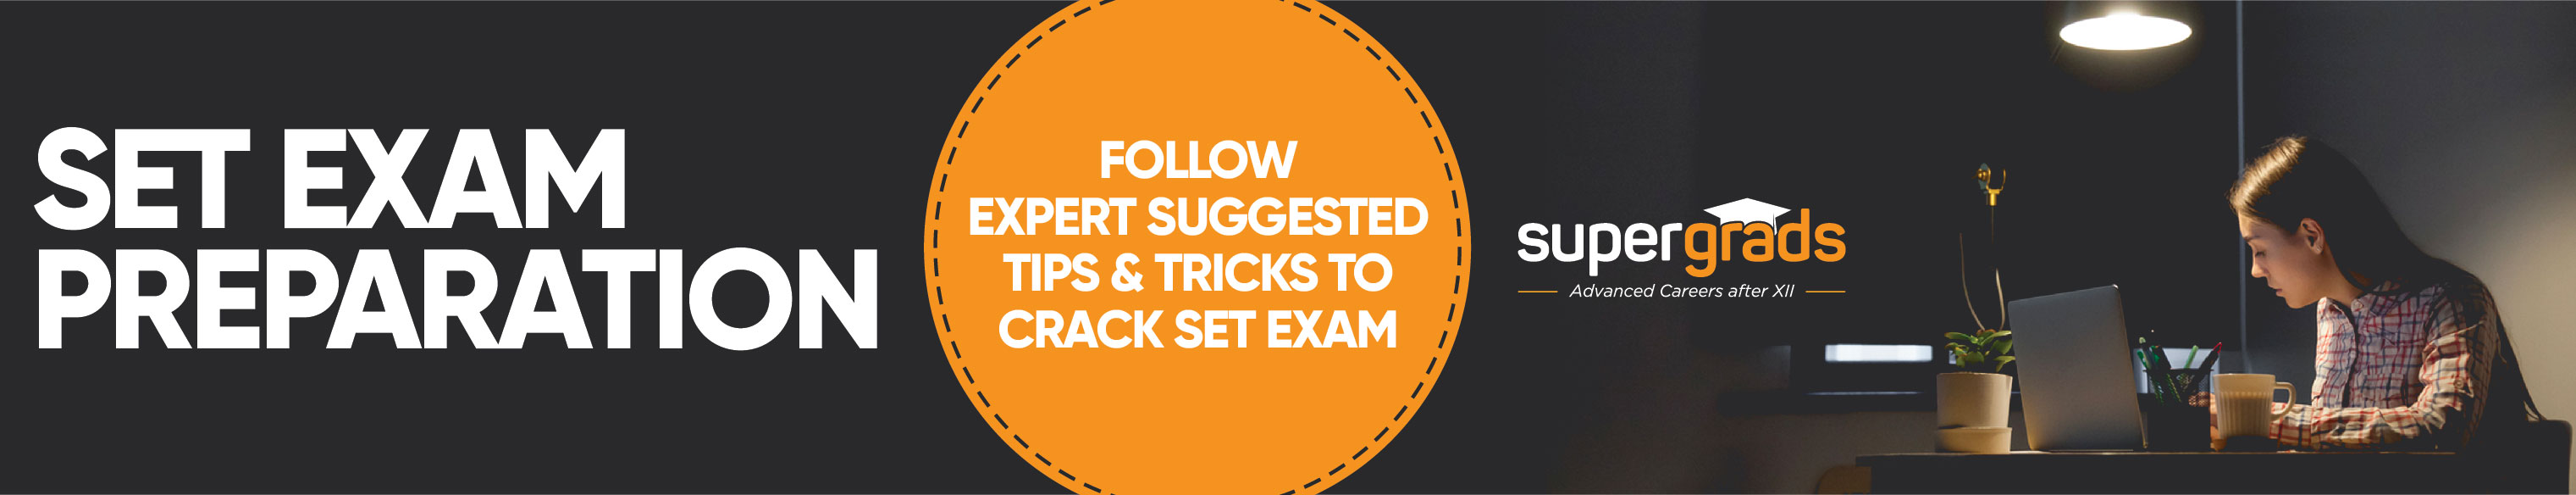 set exam preparation